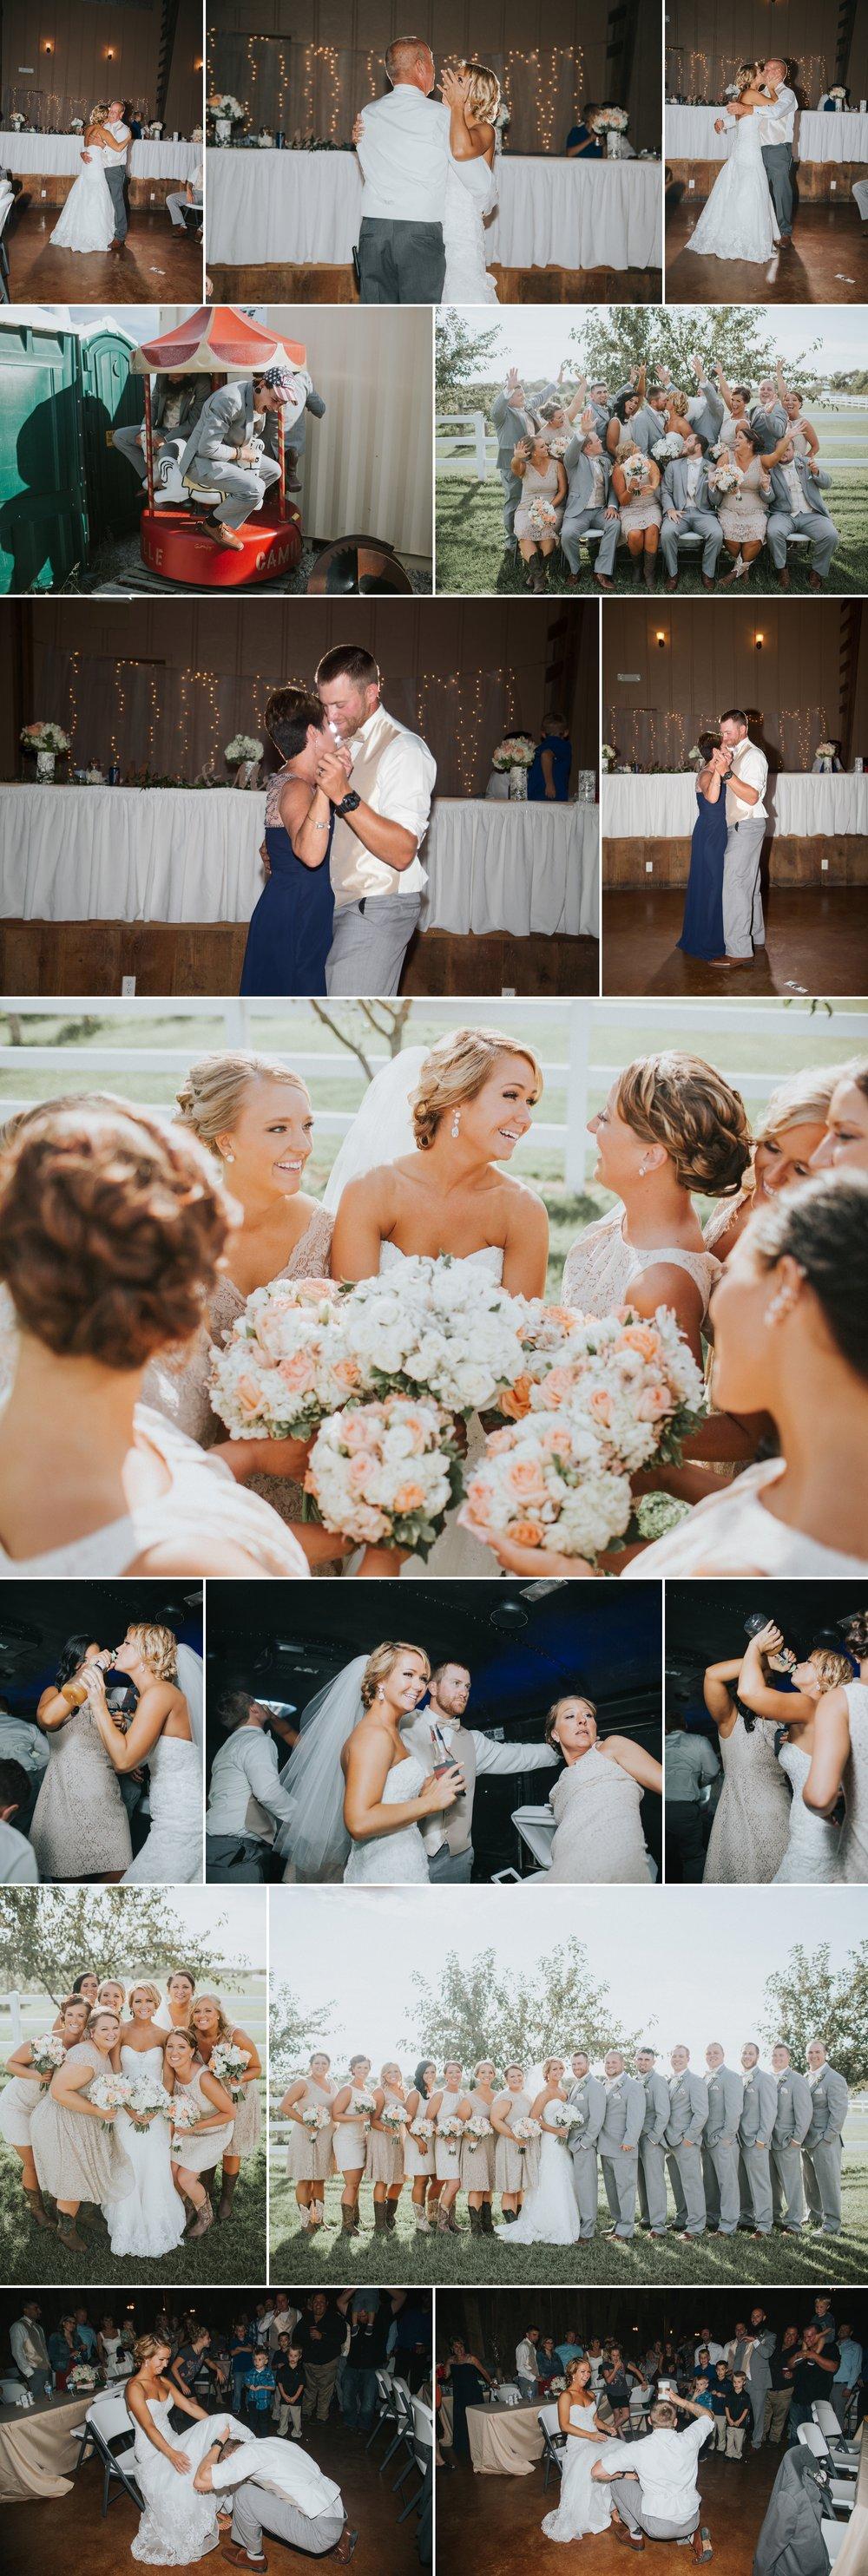 The Olson Wedding 7.jpg